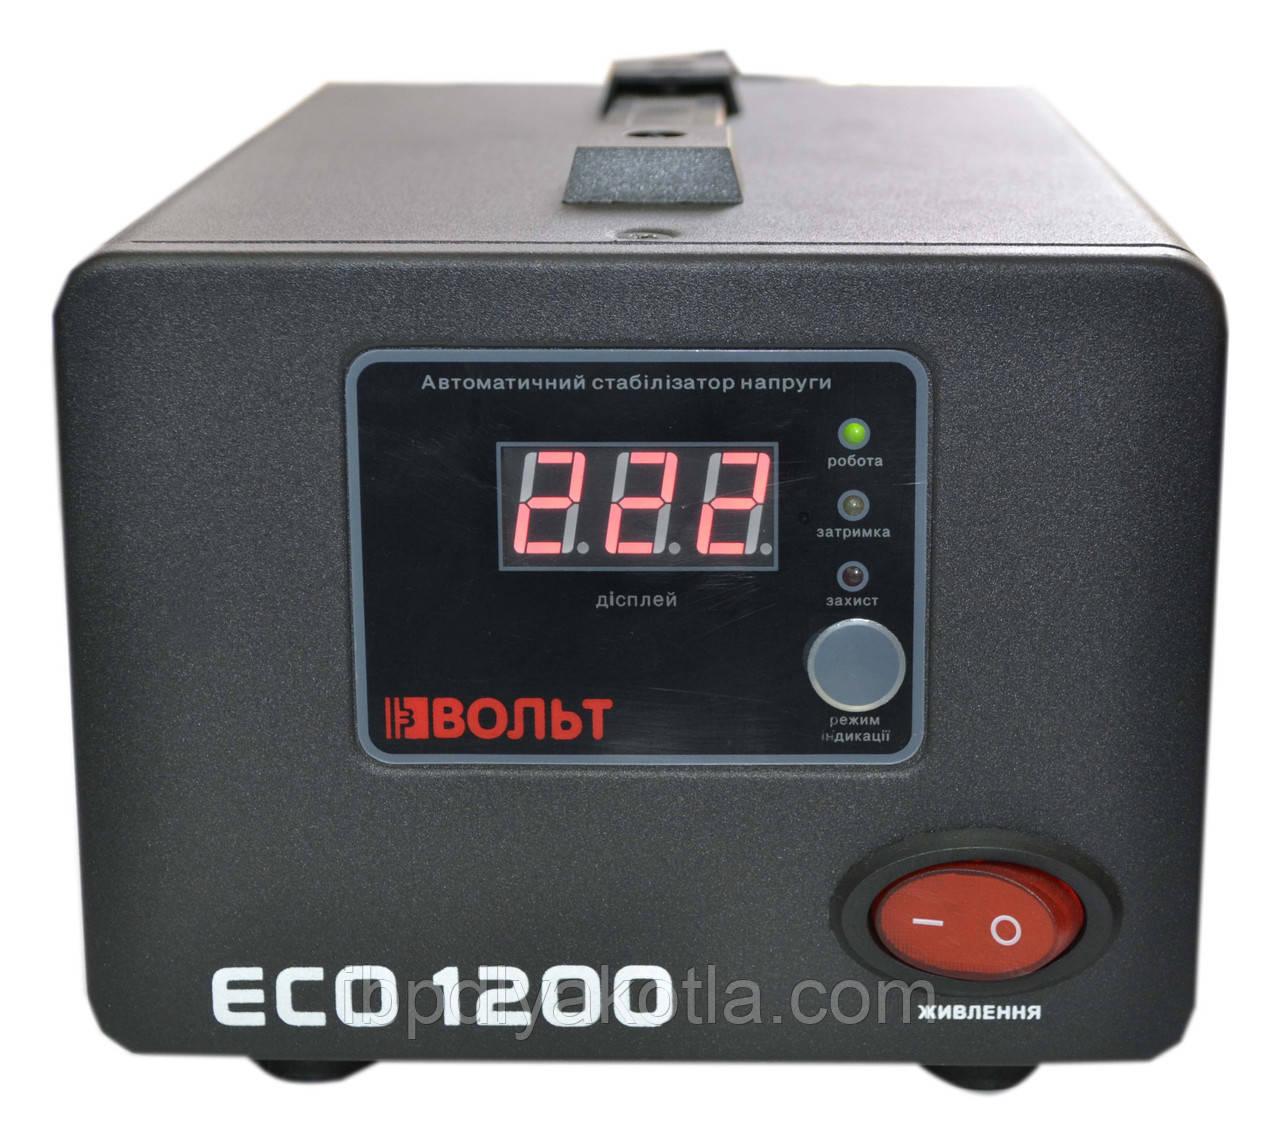 Вольт ECO-1200